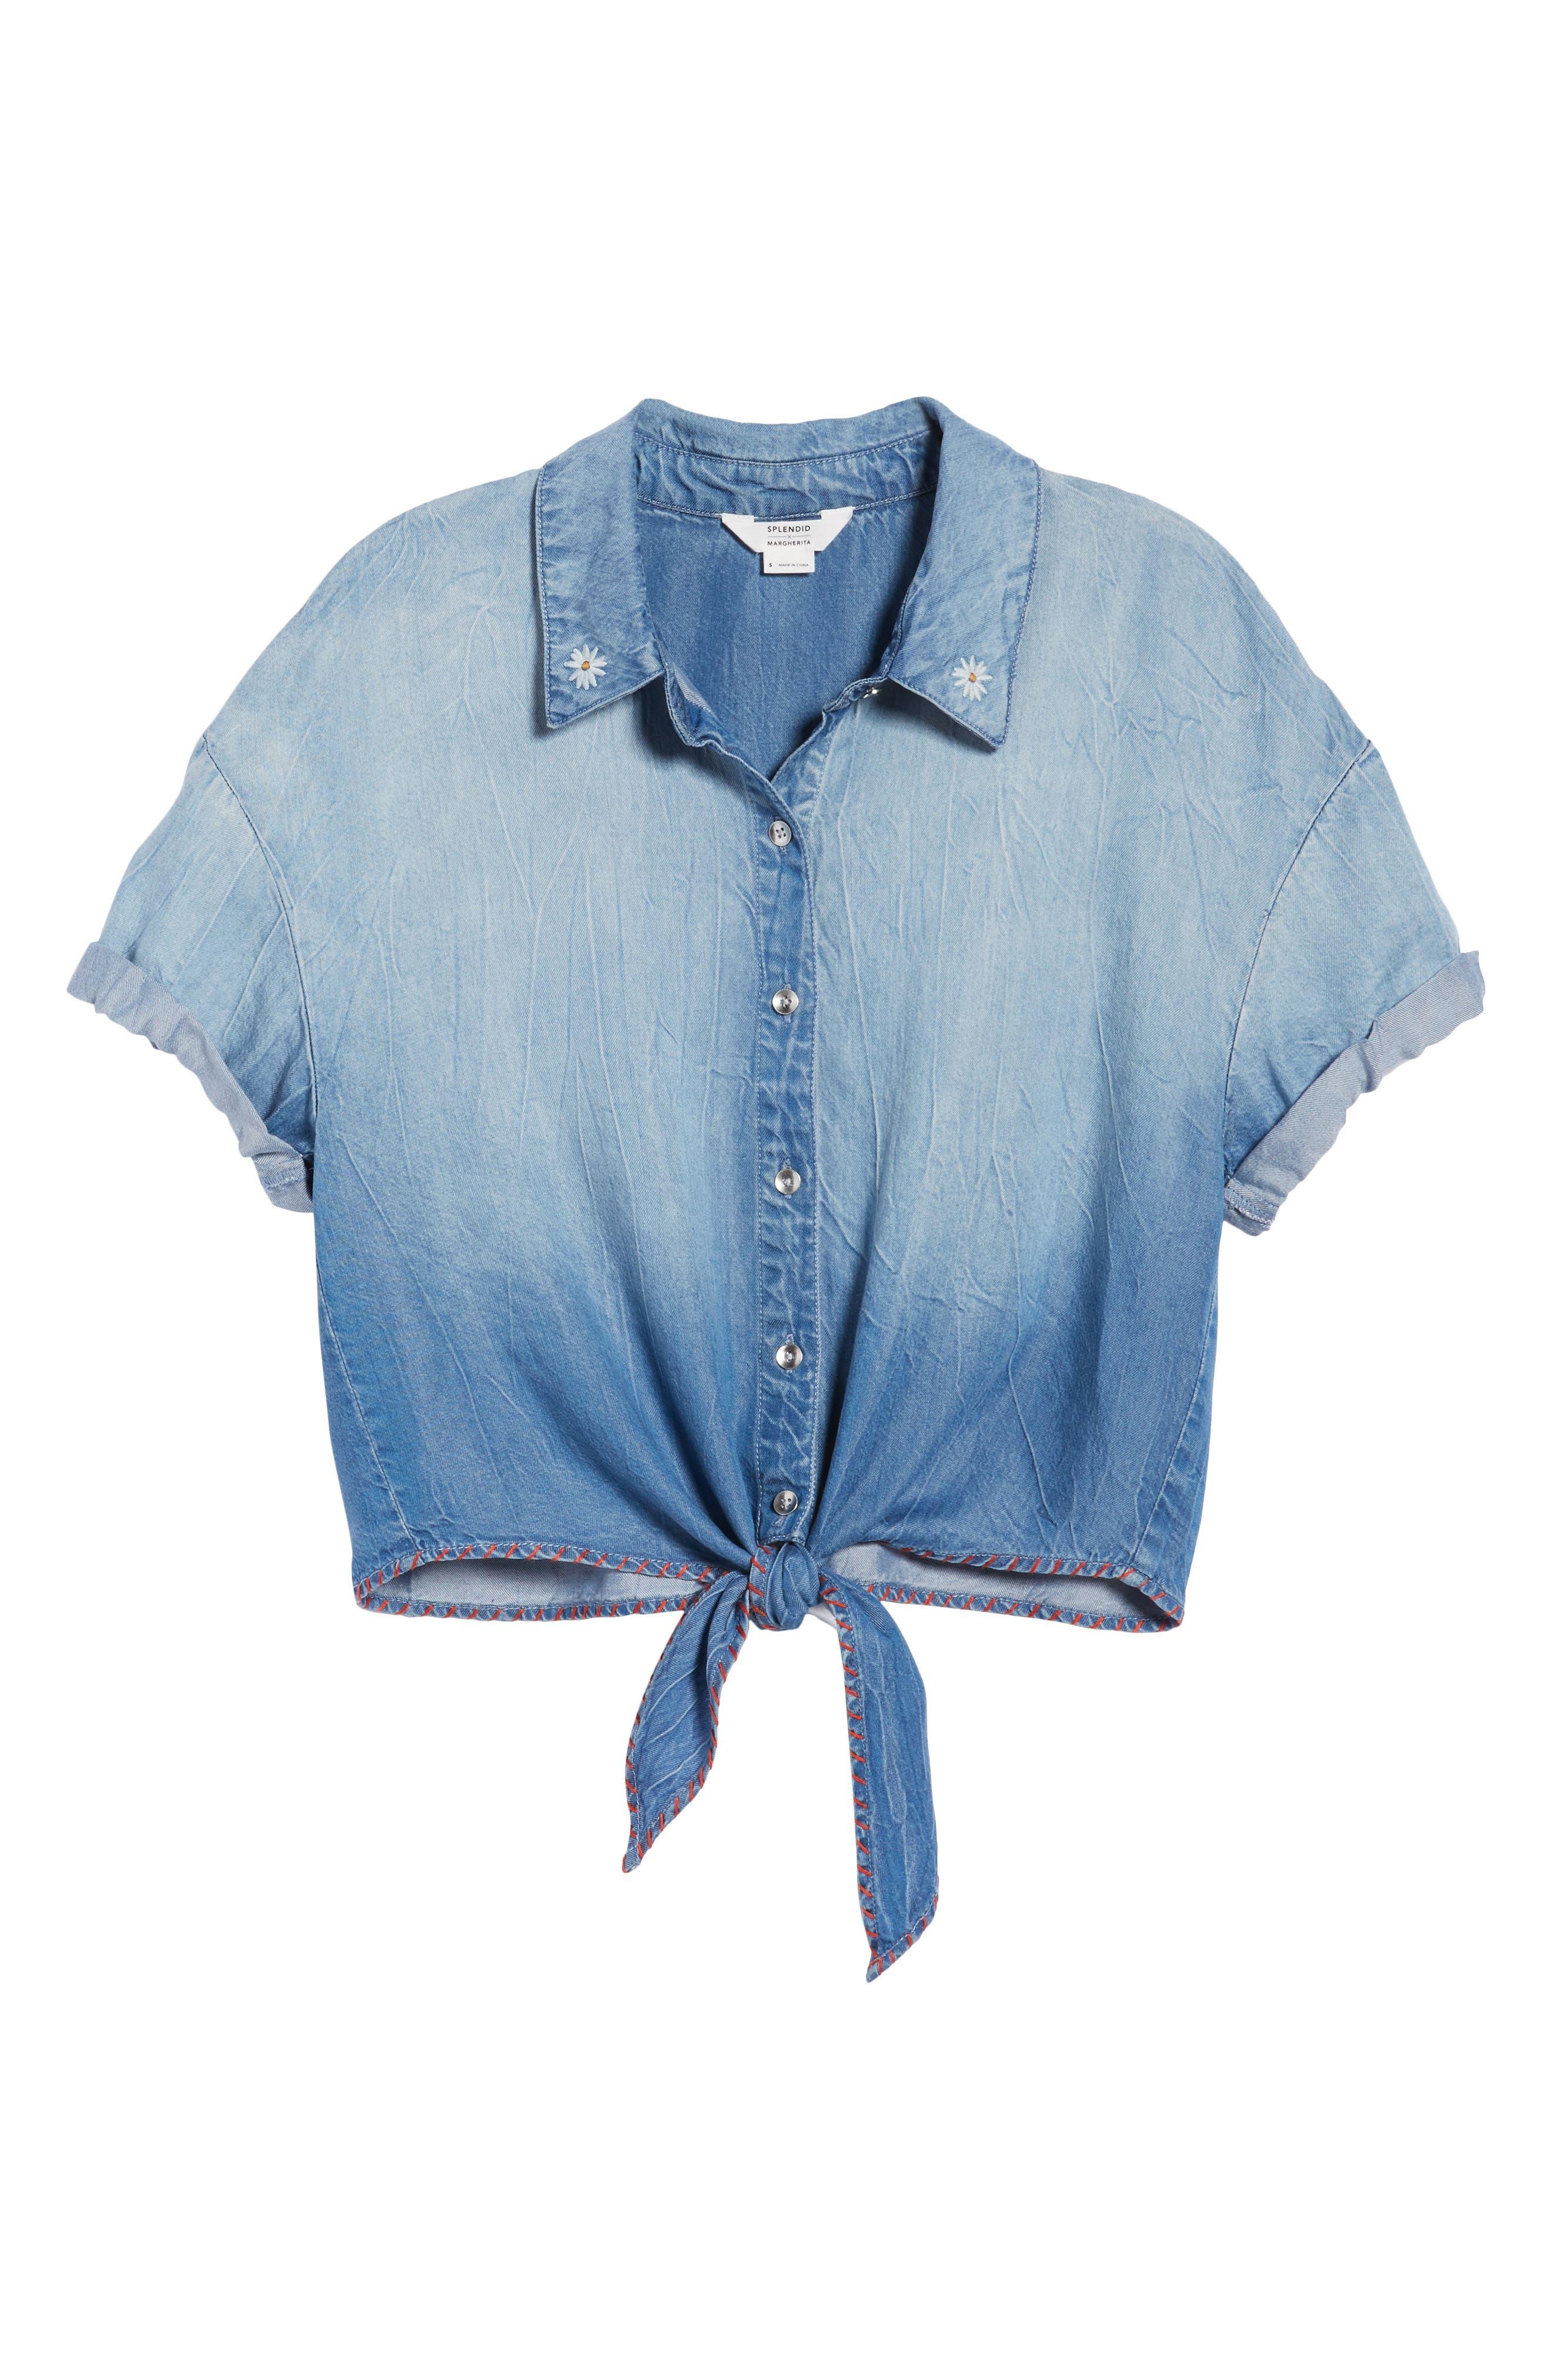 x Margherita Roma Indigo Shirt,                             Alternate thumbnail 6, color,                             Cielo Wash